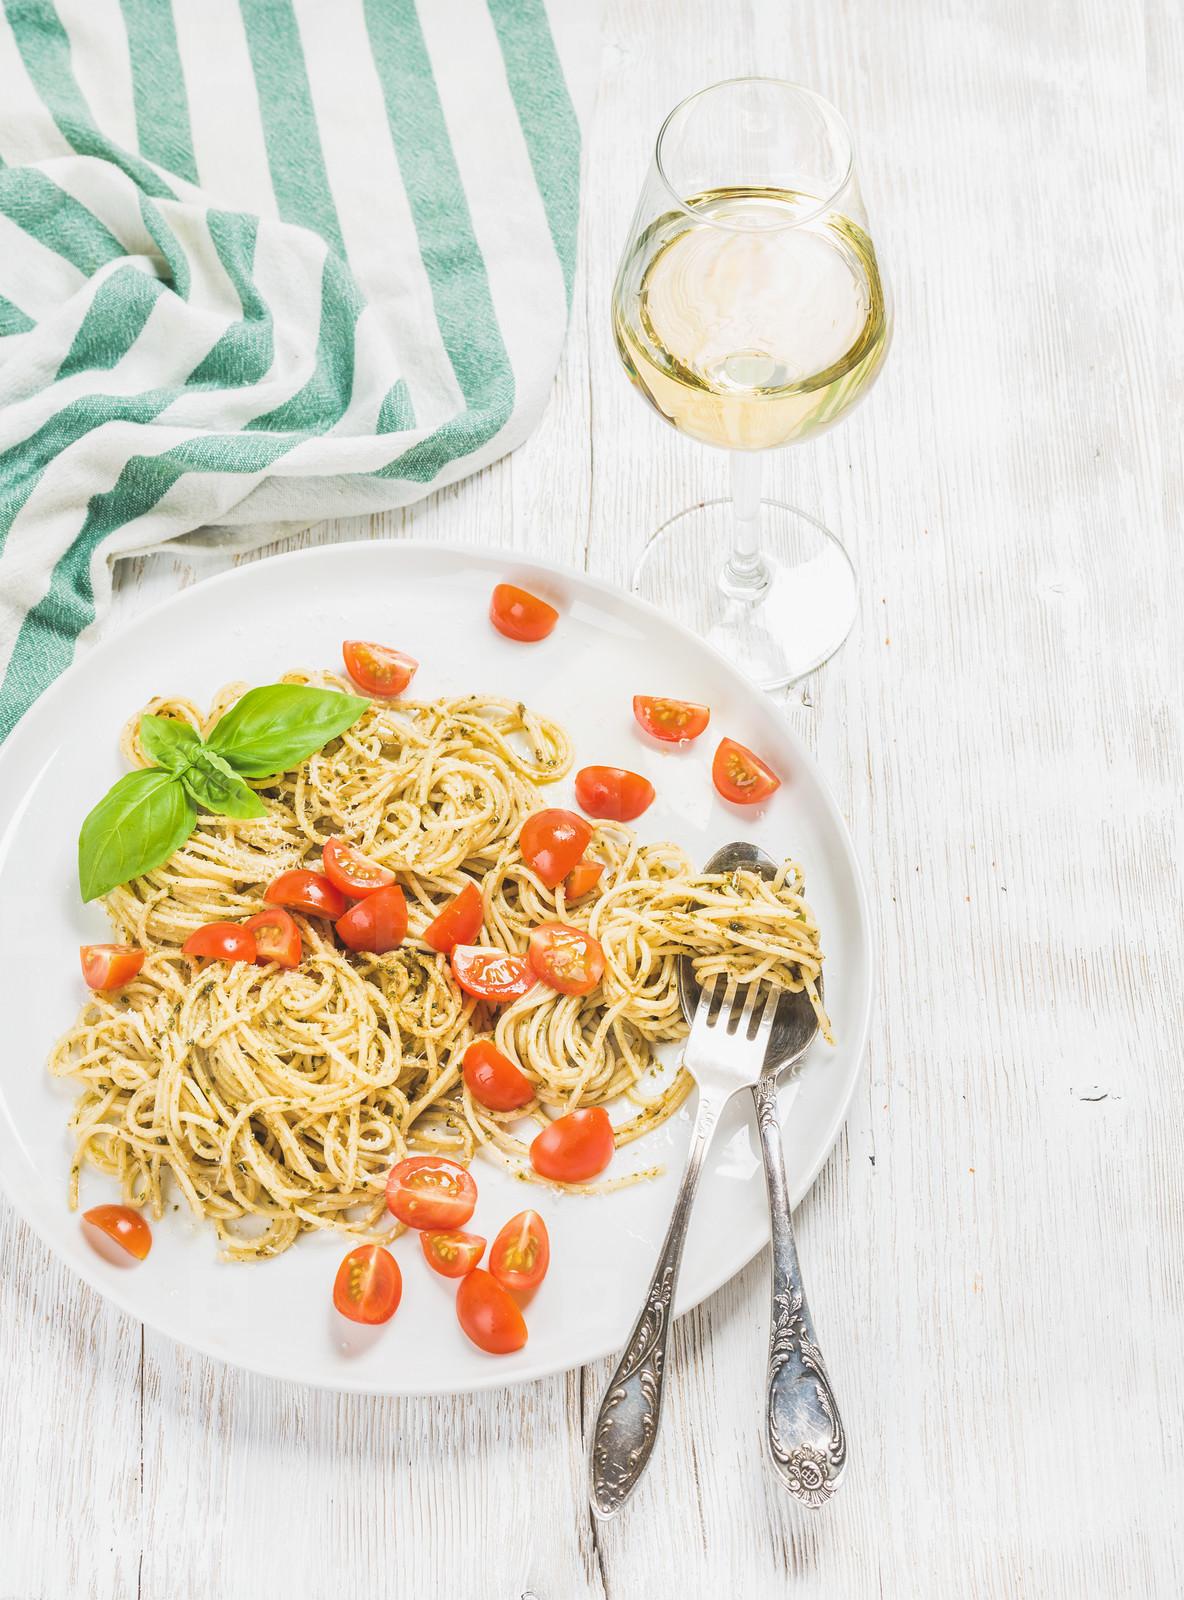 Pasta spaghetti with pesto sauce  cherry tomatoes  white wine